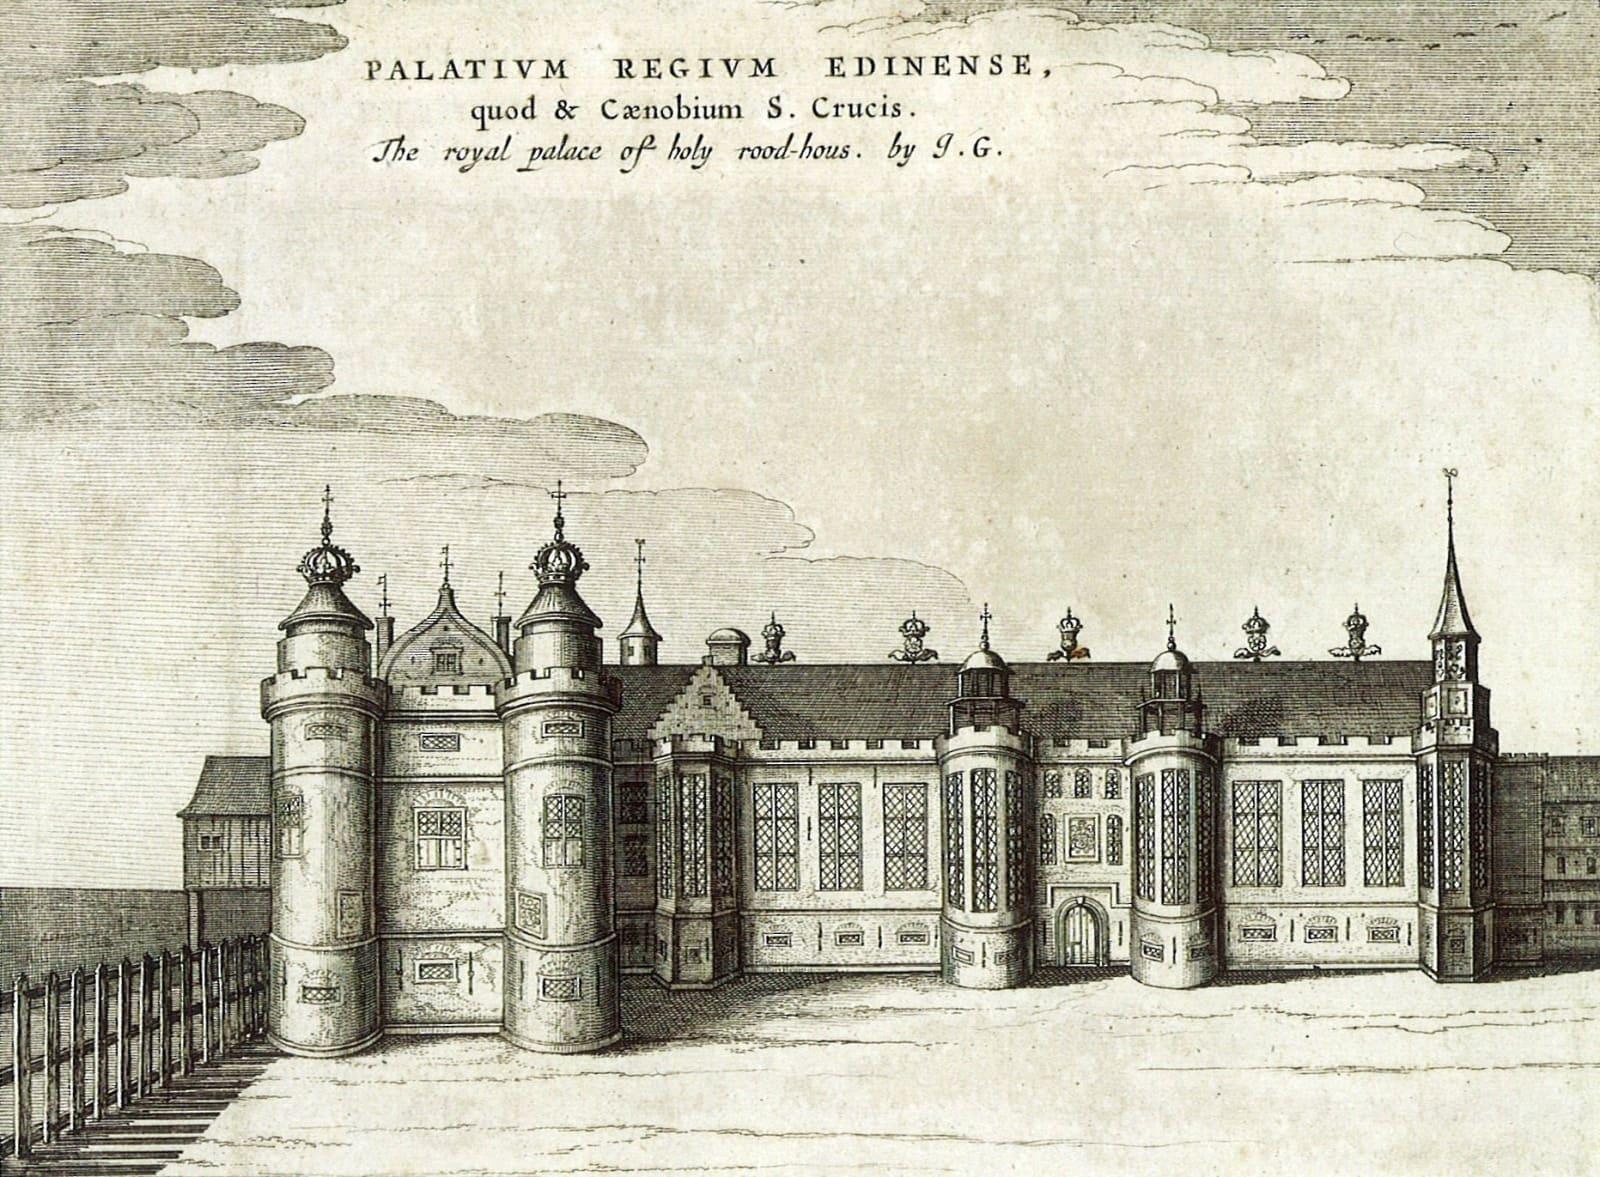 Where she passed: The Palace of Holyroodhouse, Edinburgh